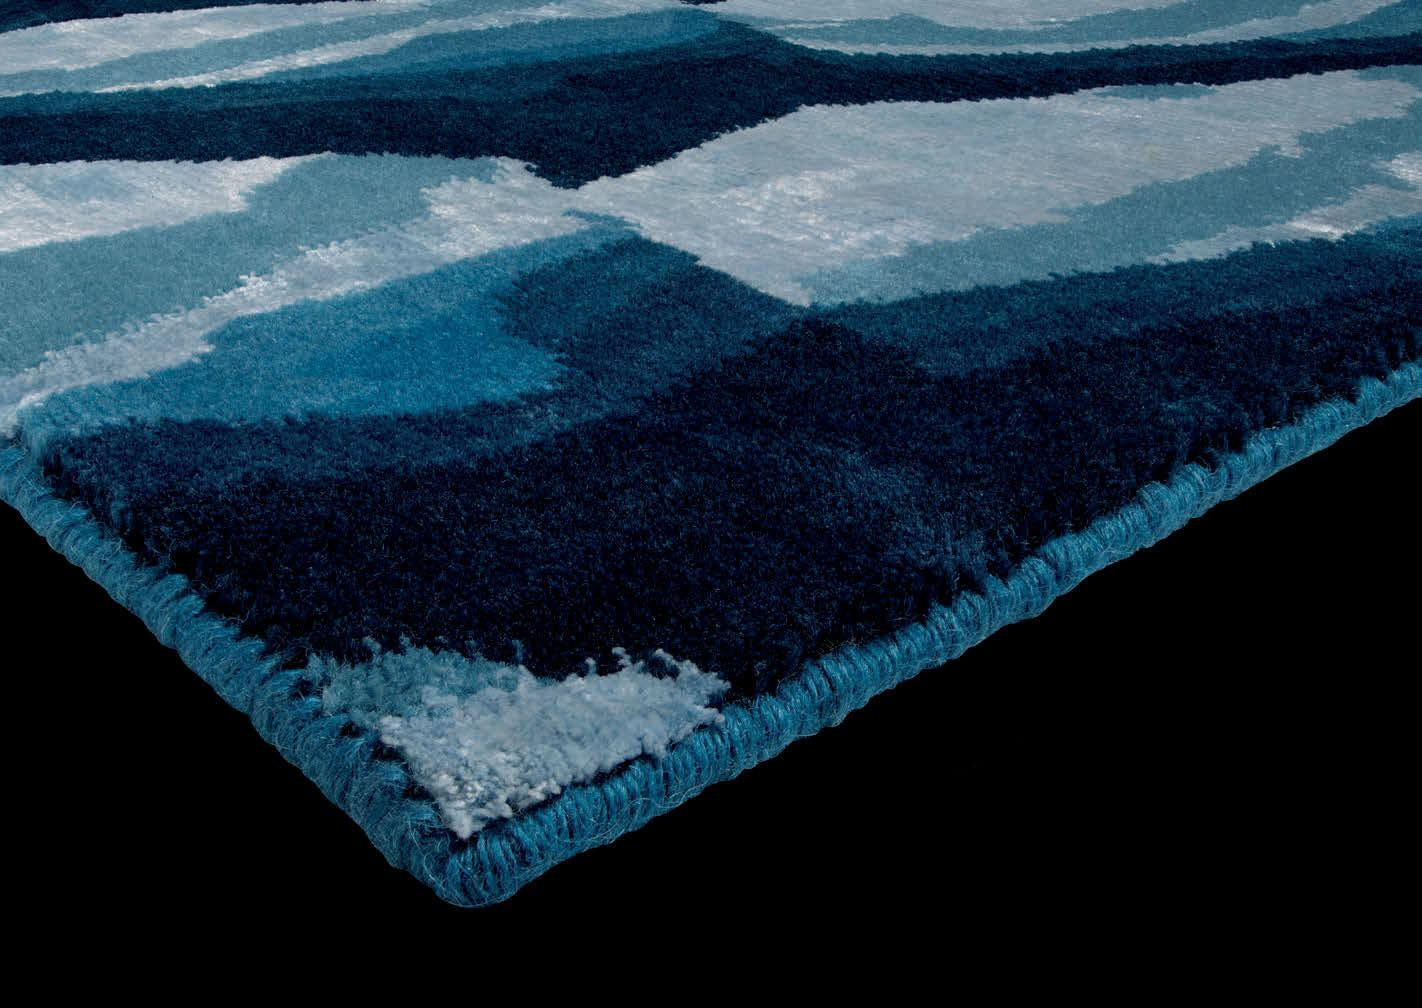 Tappeto Moderno Turchese : Ginger tappeto in seta e lana italy dream design